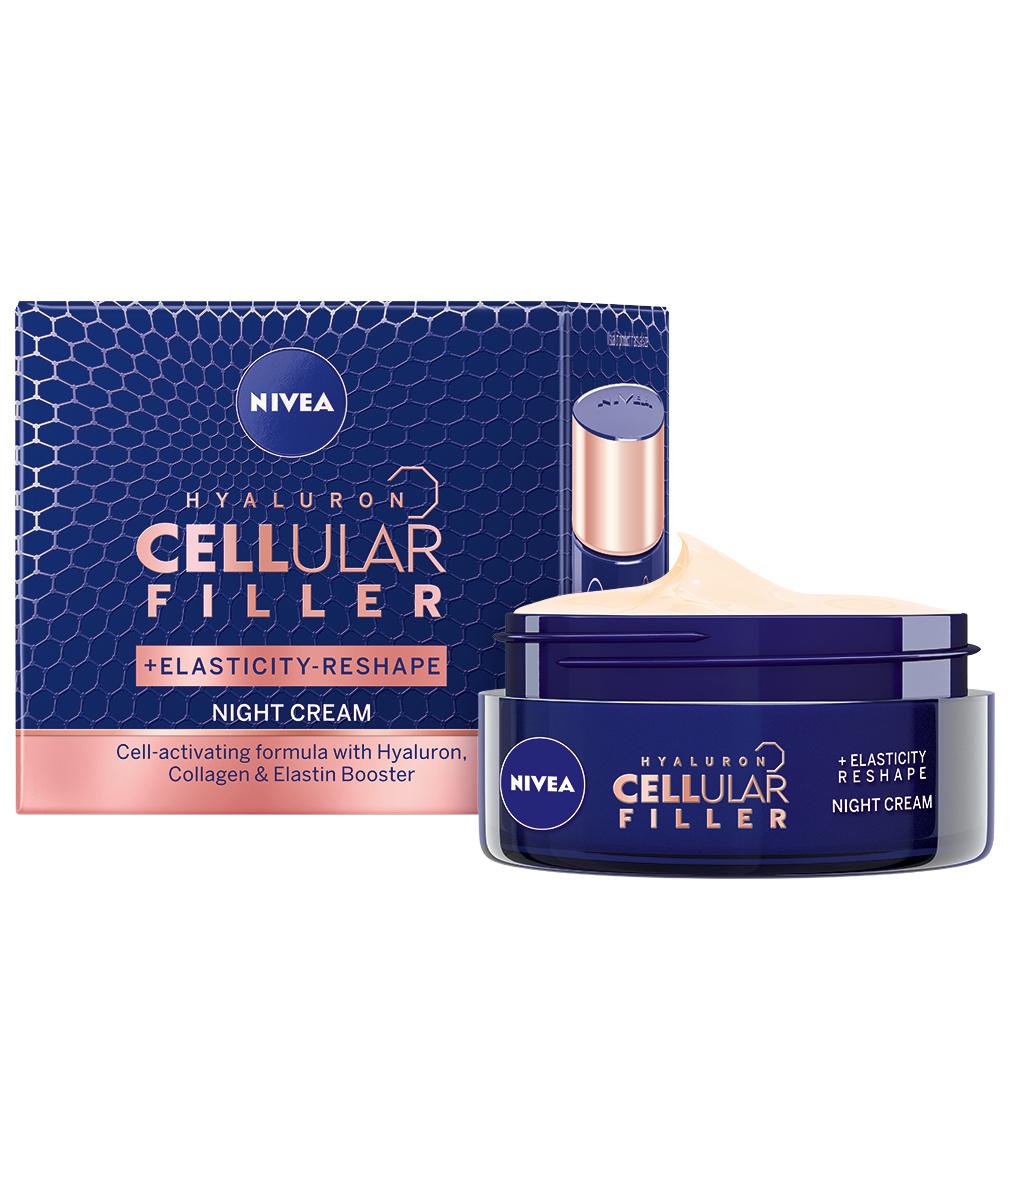 Crema de noapte_NIVEA HYALURON CELLular FILLER + Elasticity Reshape